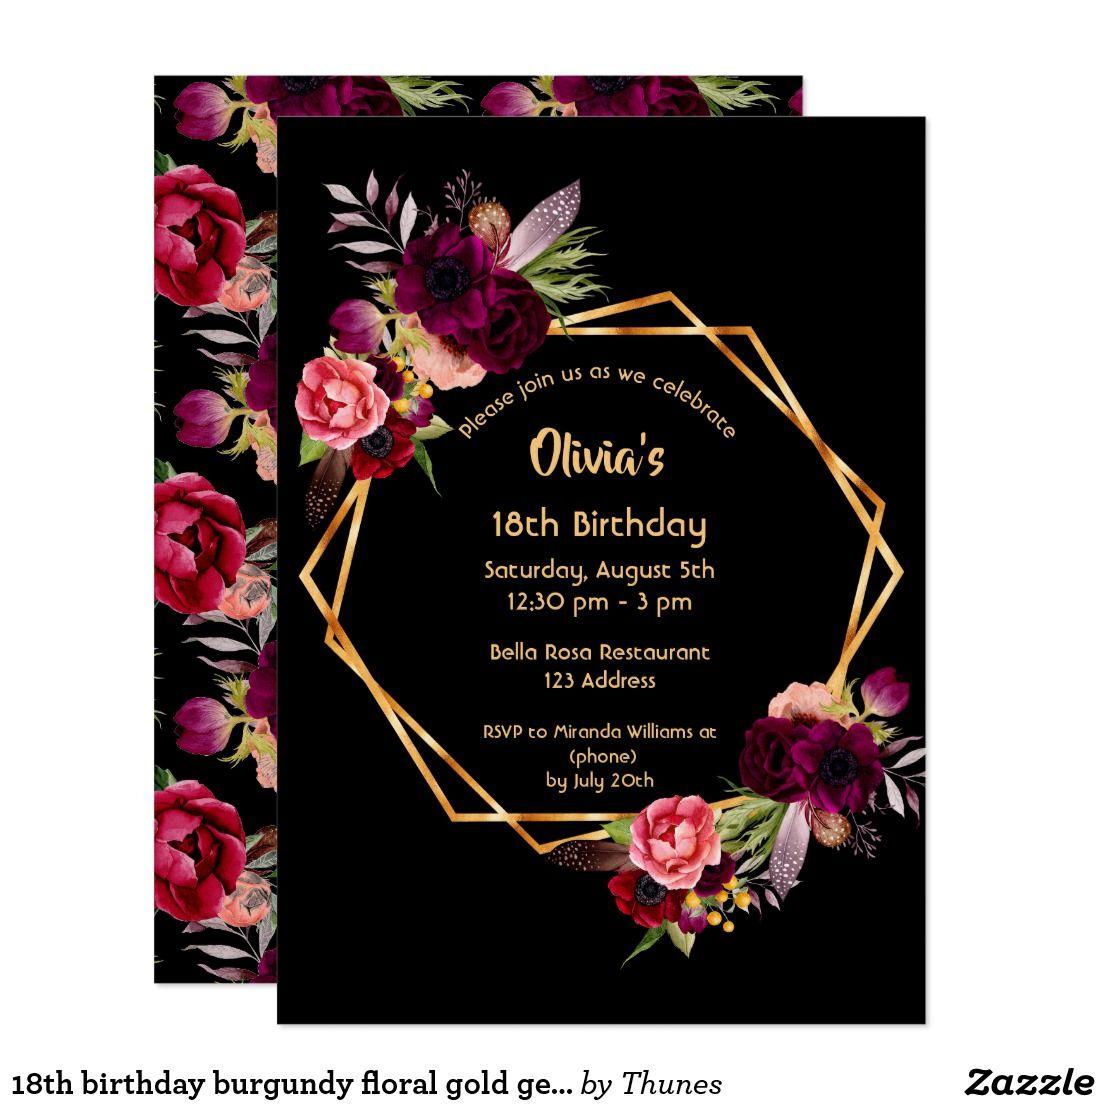 18th birthday burgundy floral gold geometric black